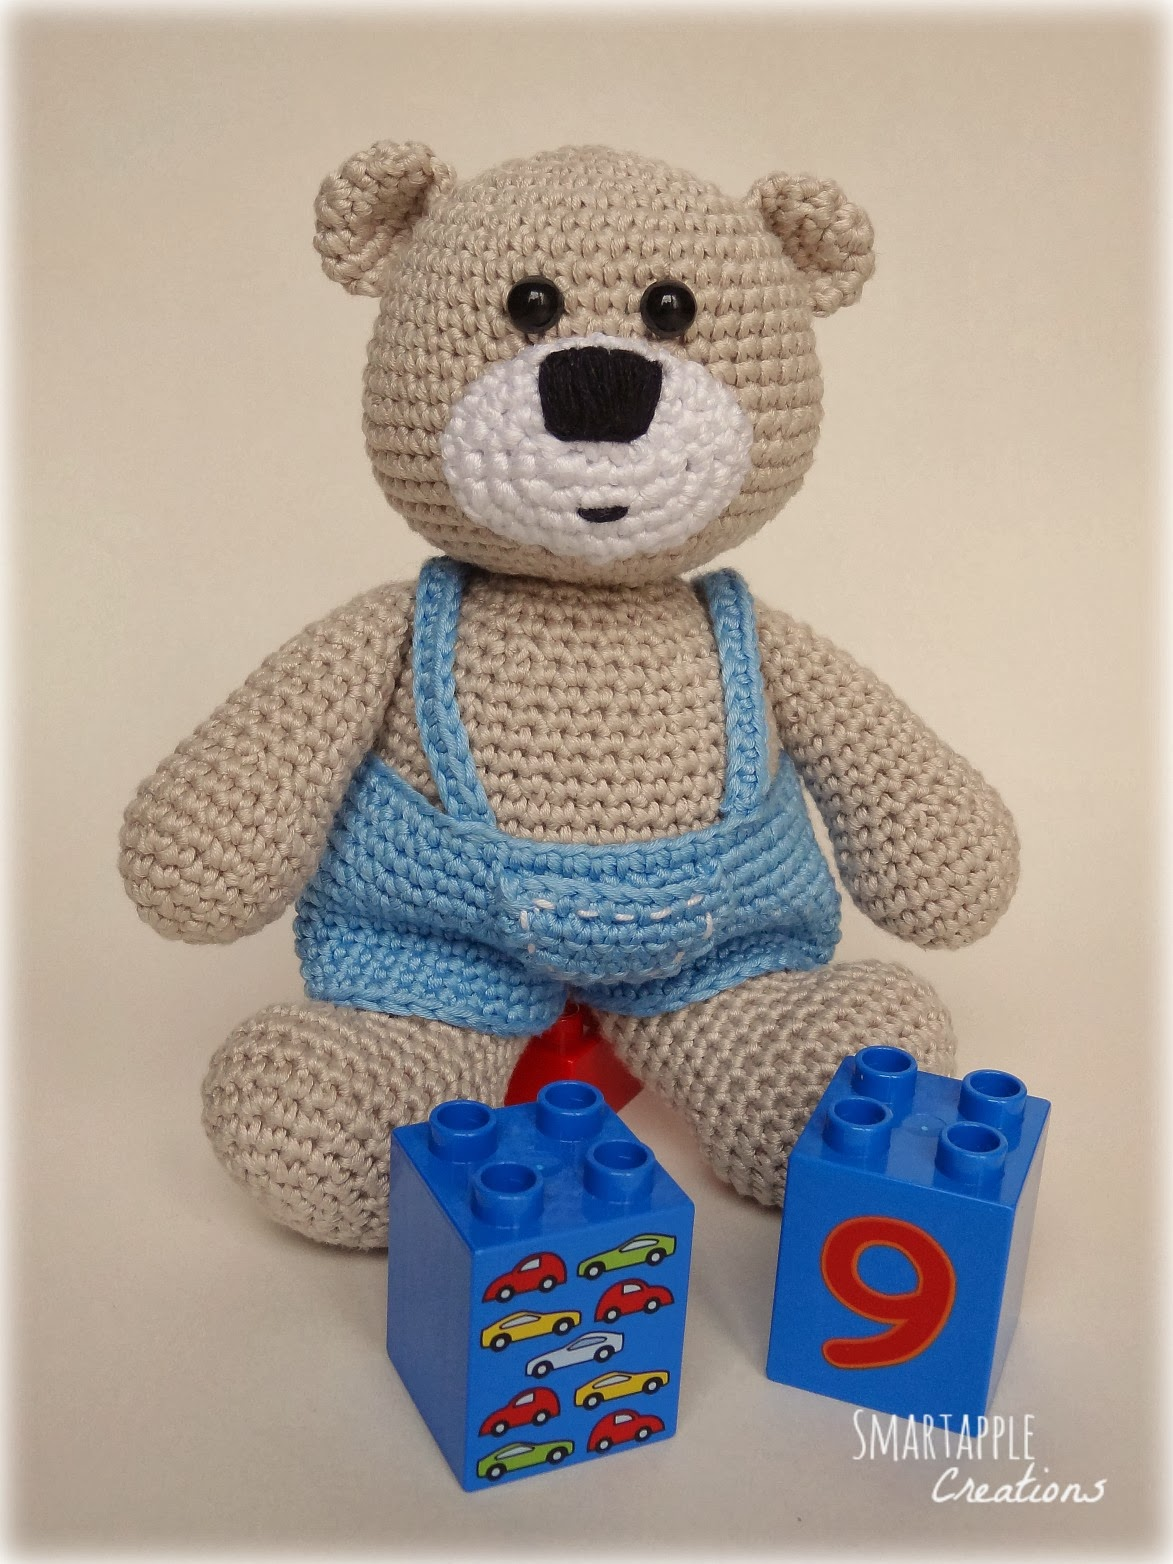 Smartapple Creations - amigurumi and crochet: Amigurumi ...